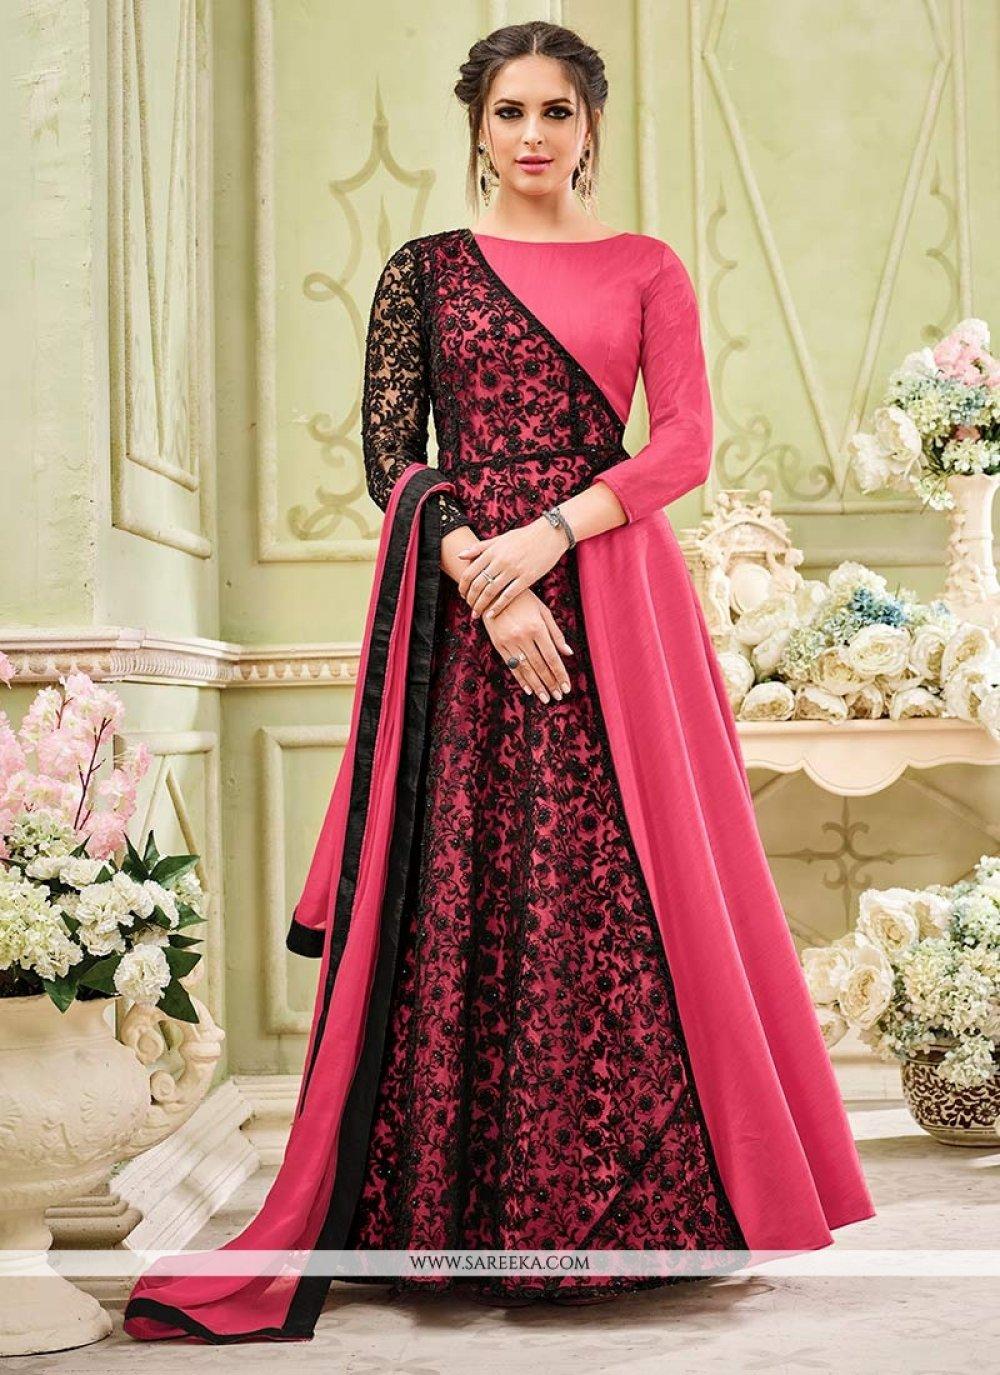 Faux Georgette Embroidered Work Floor Length Anarkali Suit